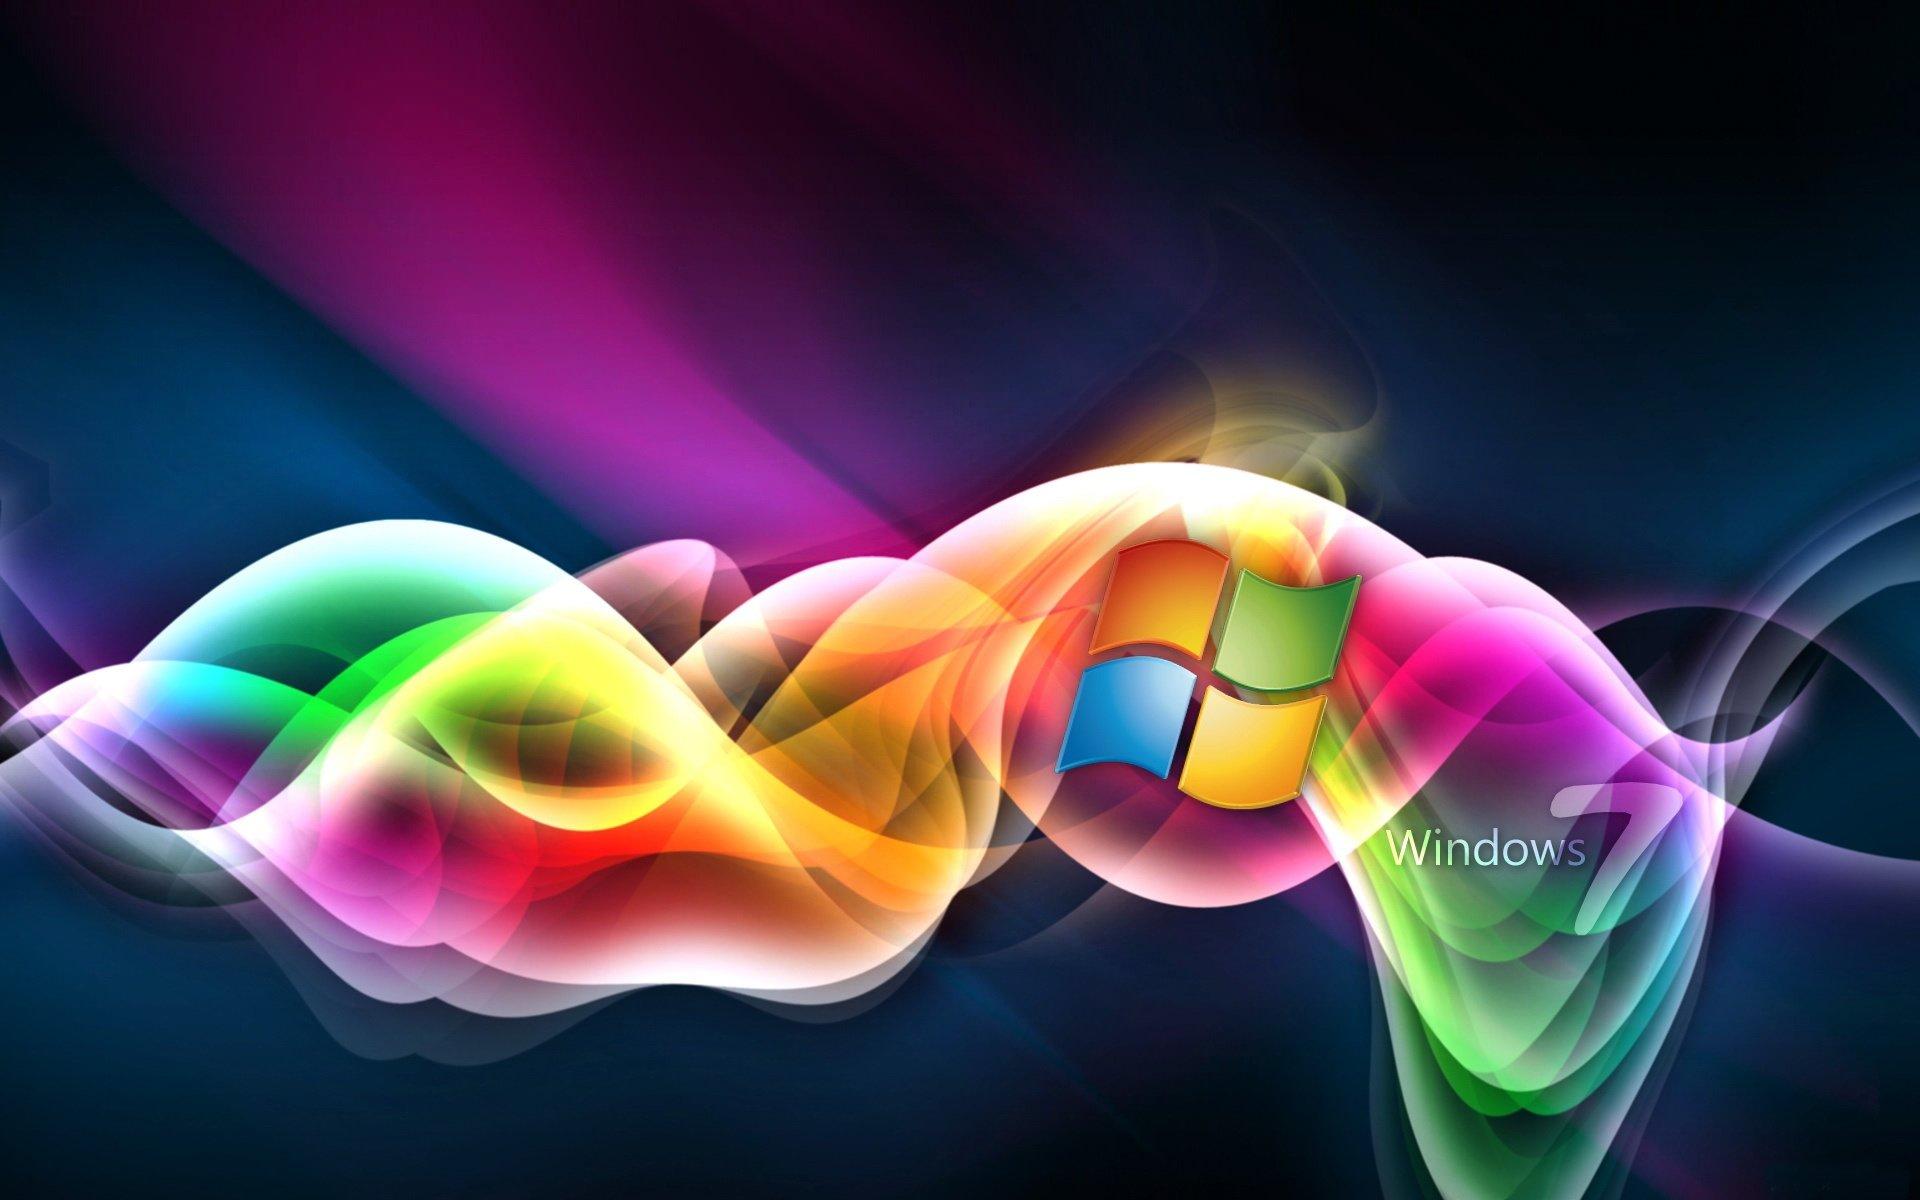 3d Live Wallpaper Windows 10